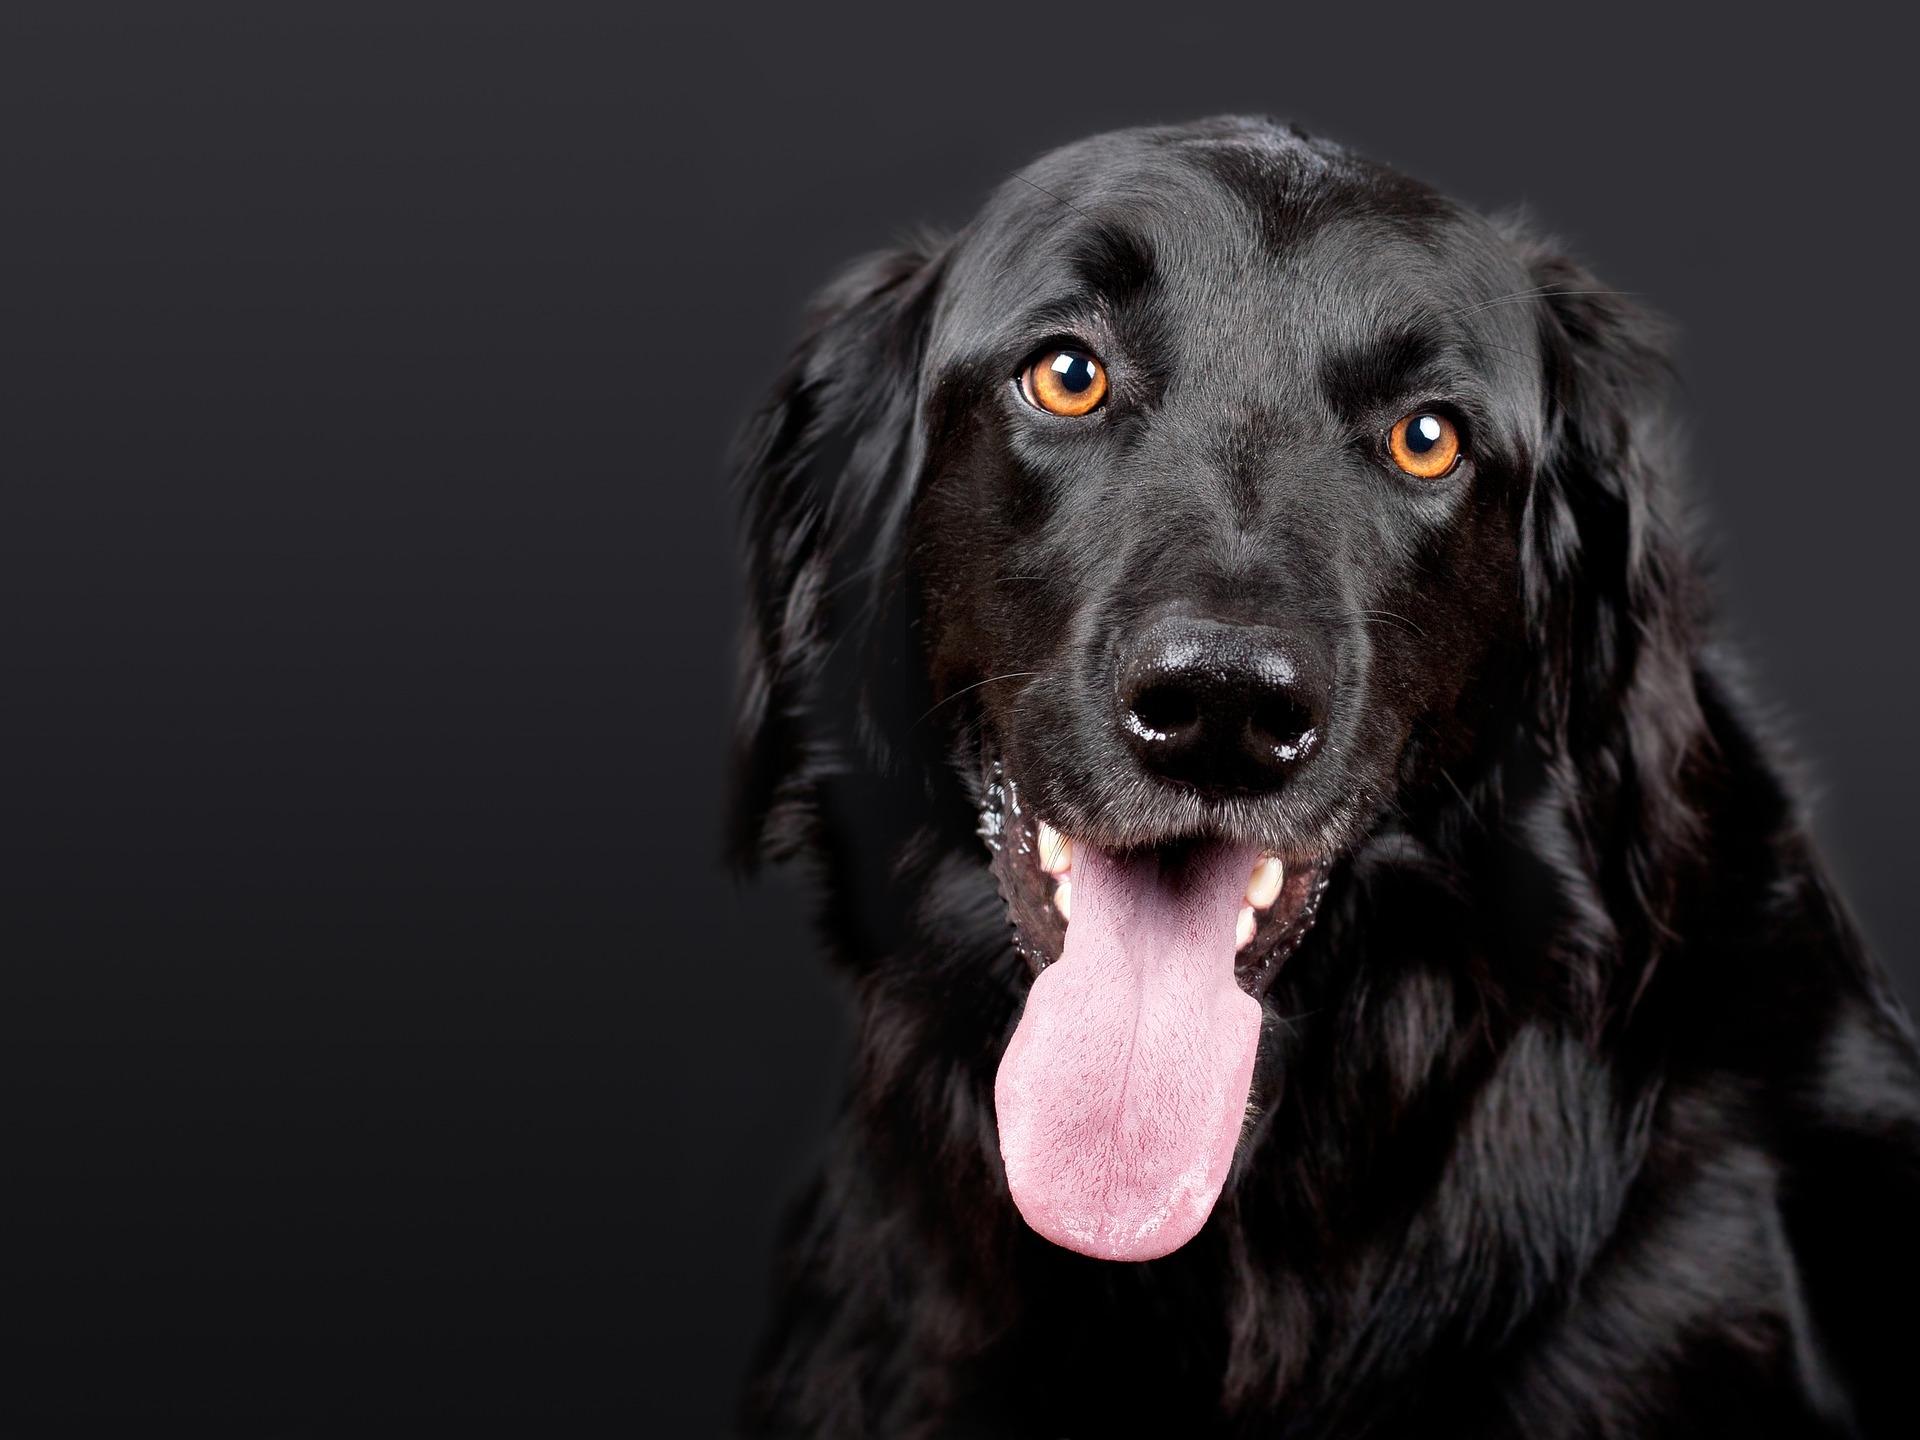 dog-1194087_1920.jpg